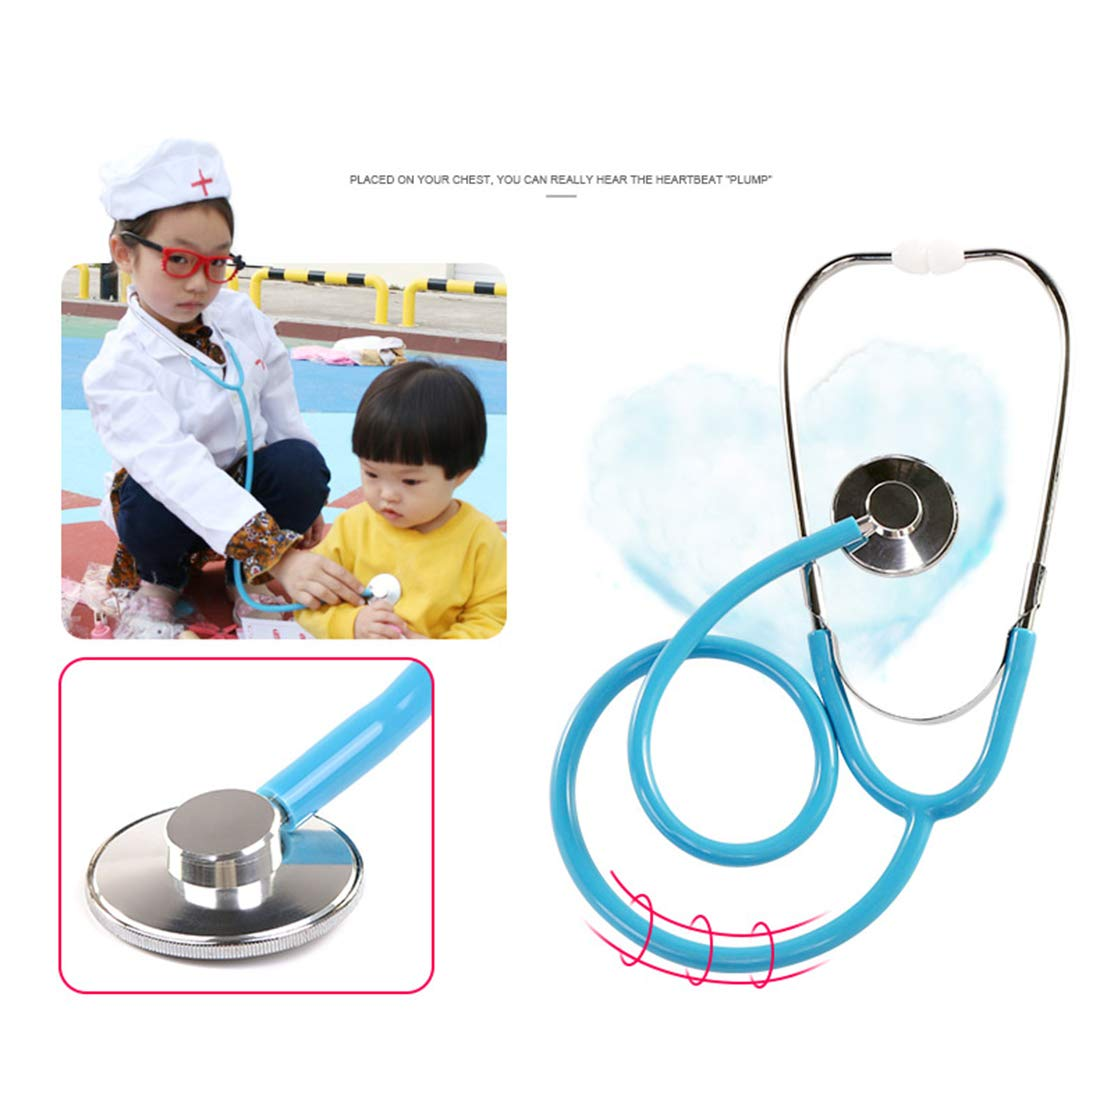 Yavso 28 Piezas Maletin Medico Juguete Maletin Doctora Madera Medico Juguetes para Infantil Ni/ño Ni/ña 3 Anos